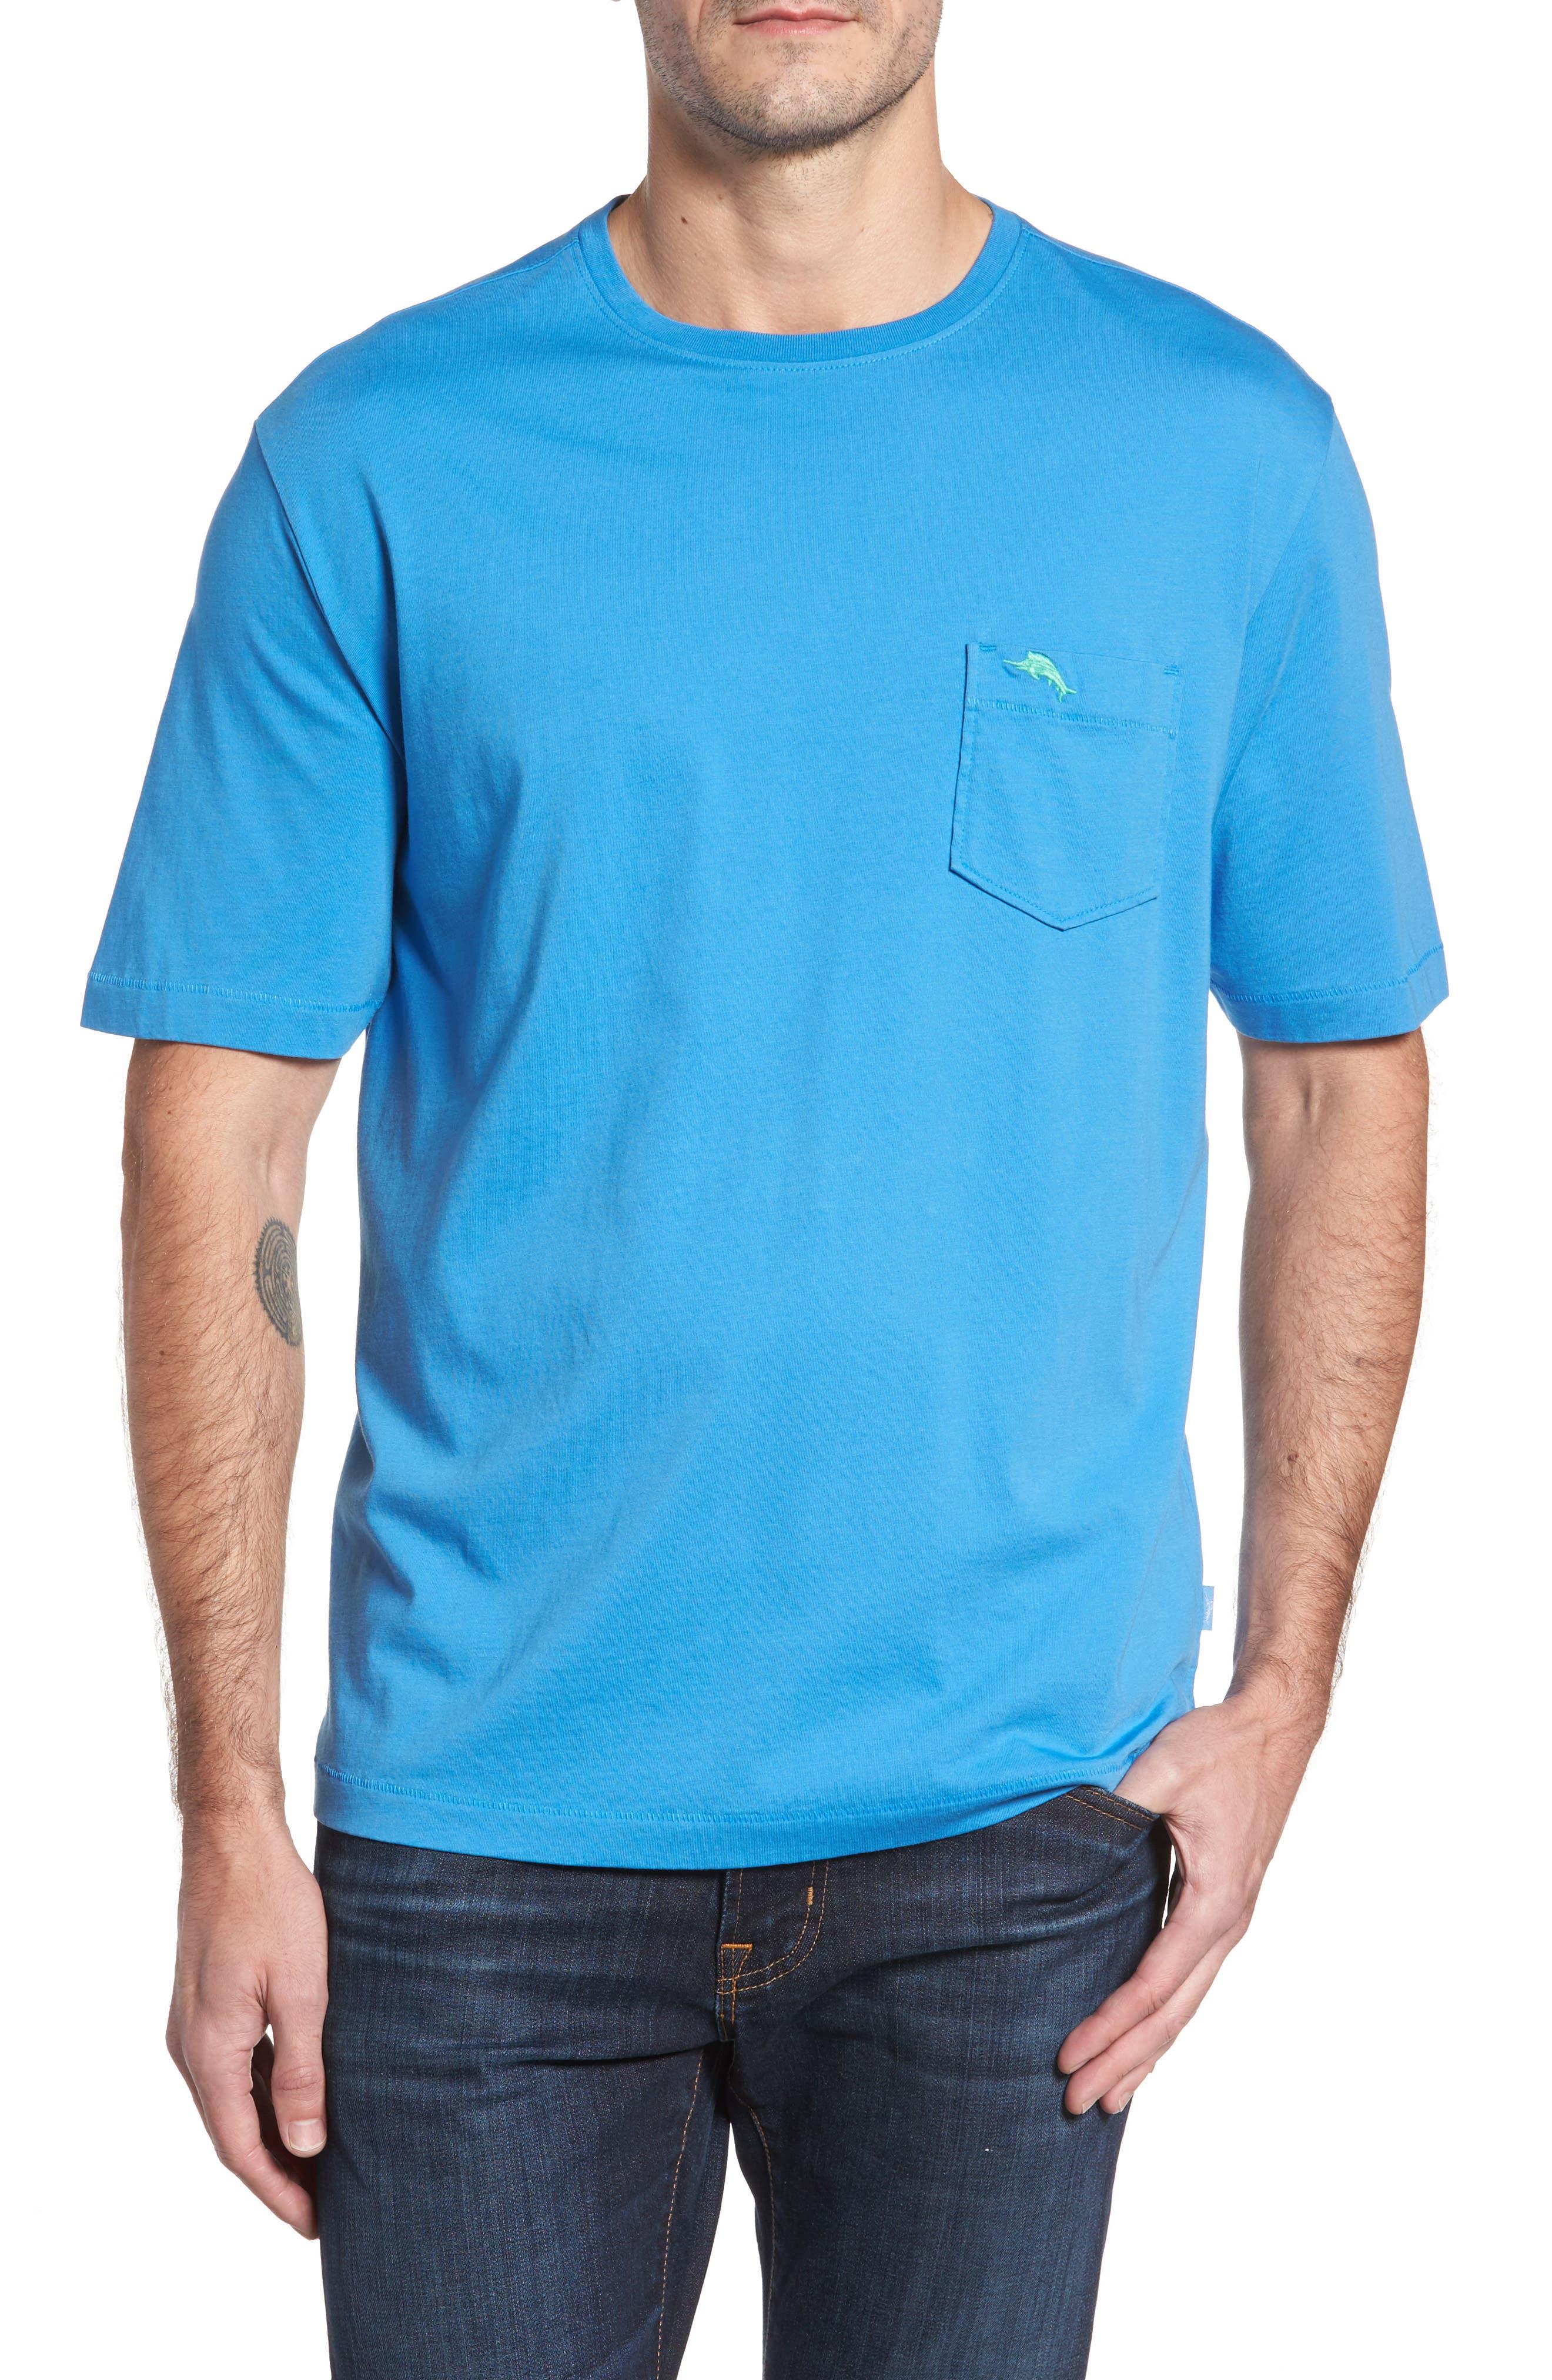 Main Image - Tommy Bahama Bali Skyline Pocket T-Shirt